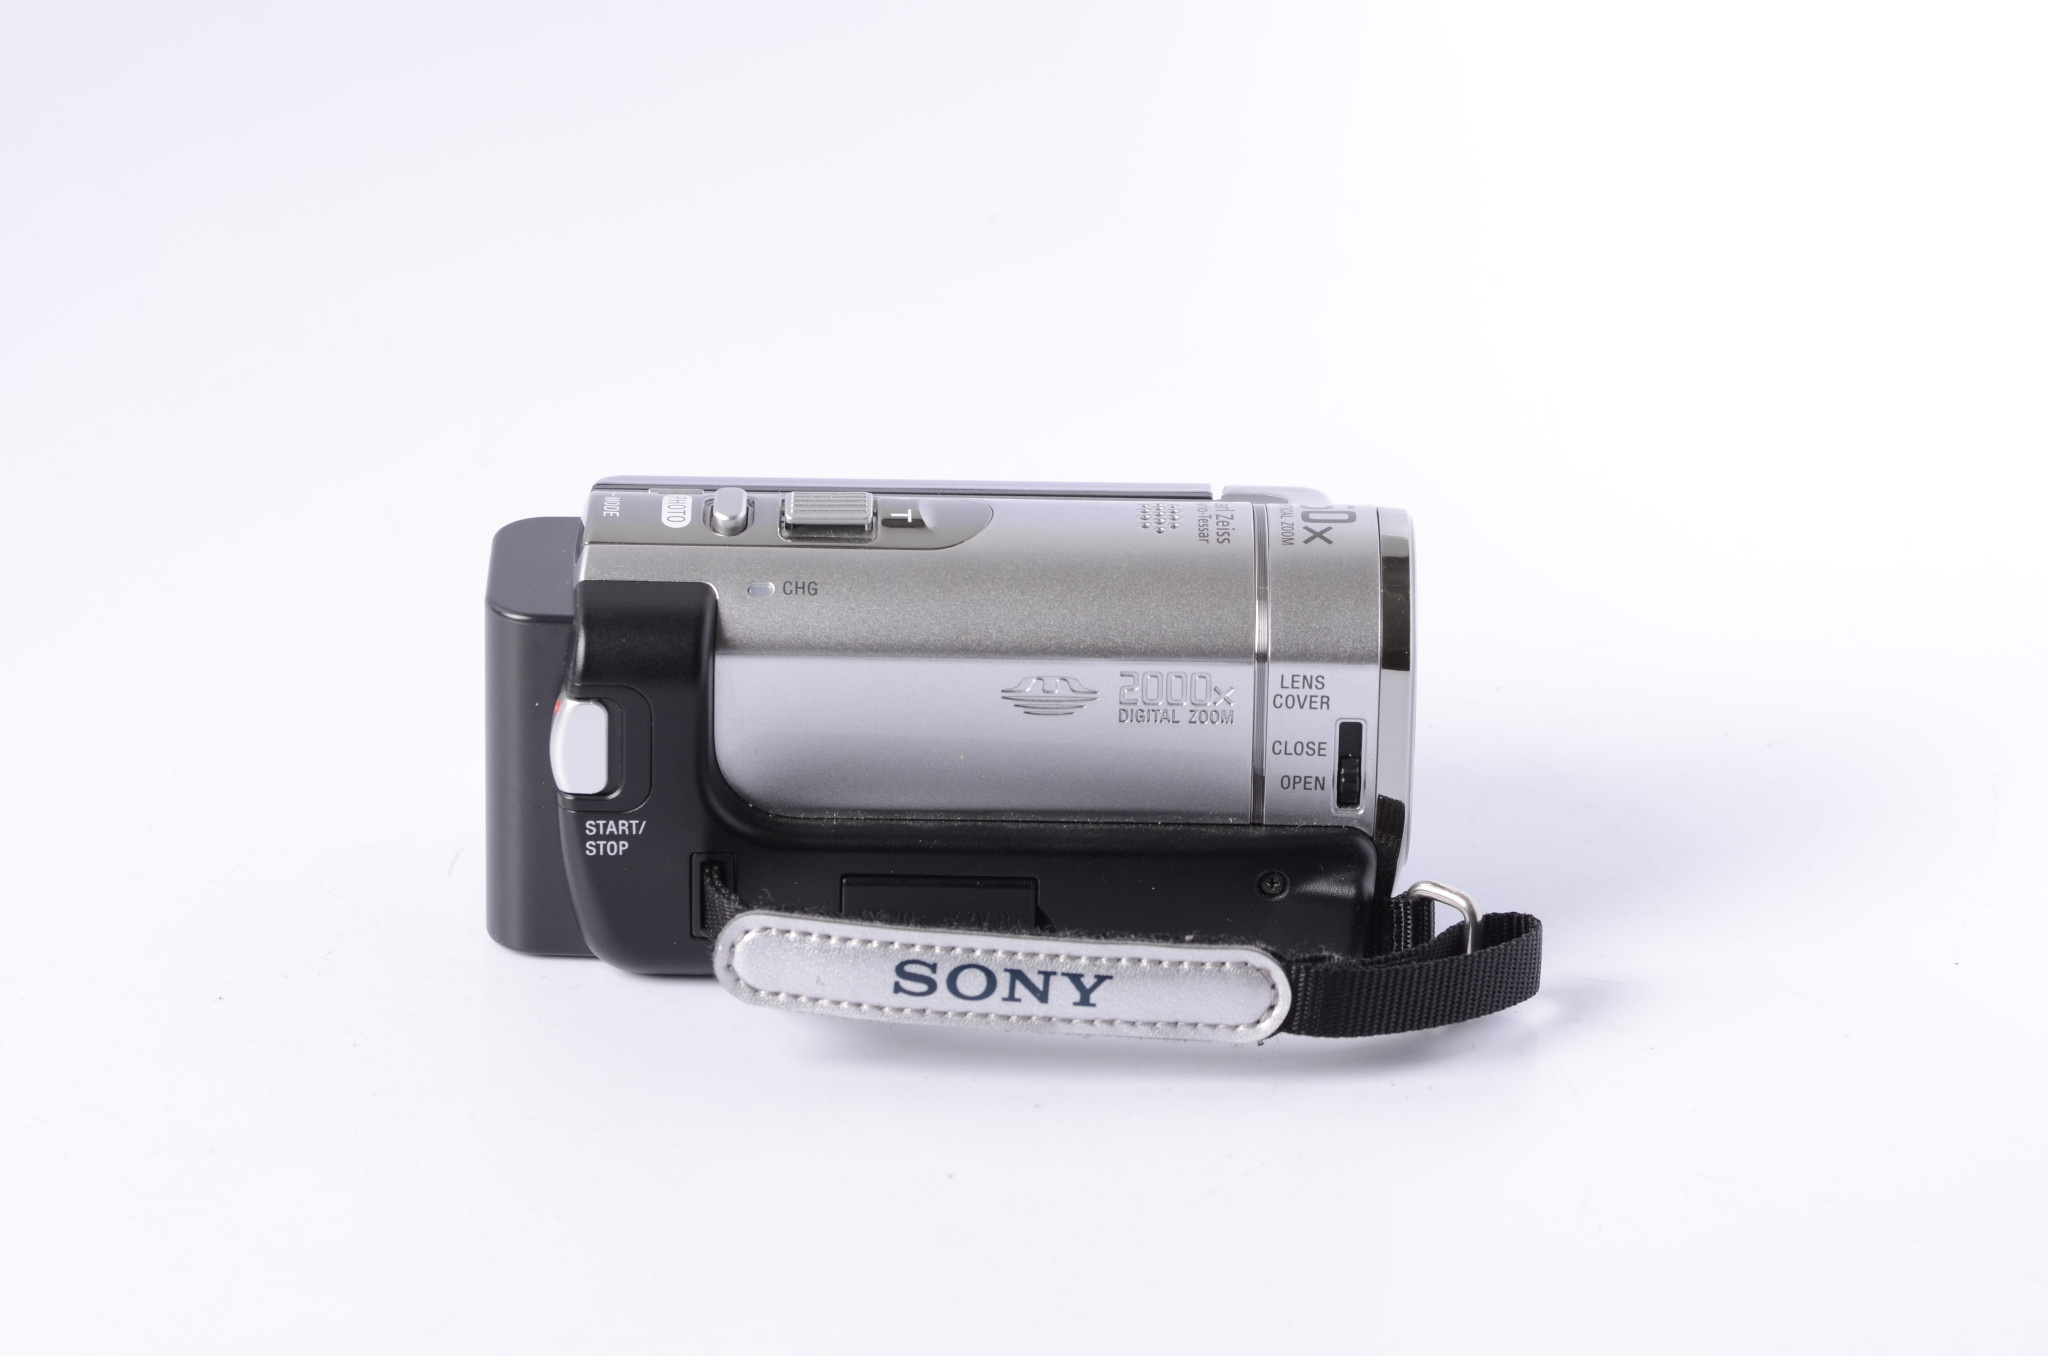 Sony Sony Handycam DCR-SX63 SN: 1138556